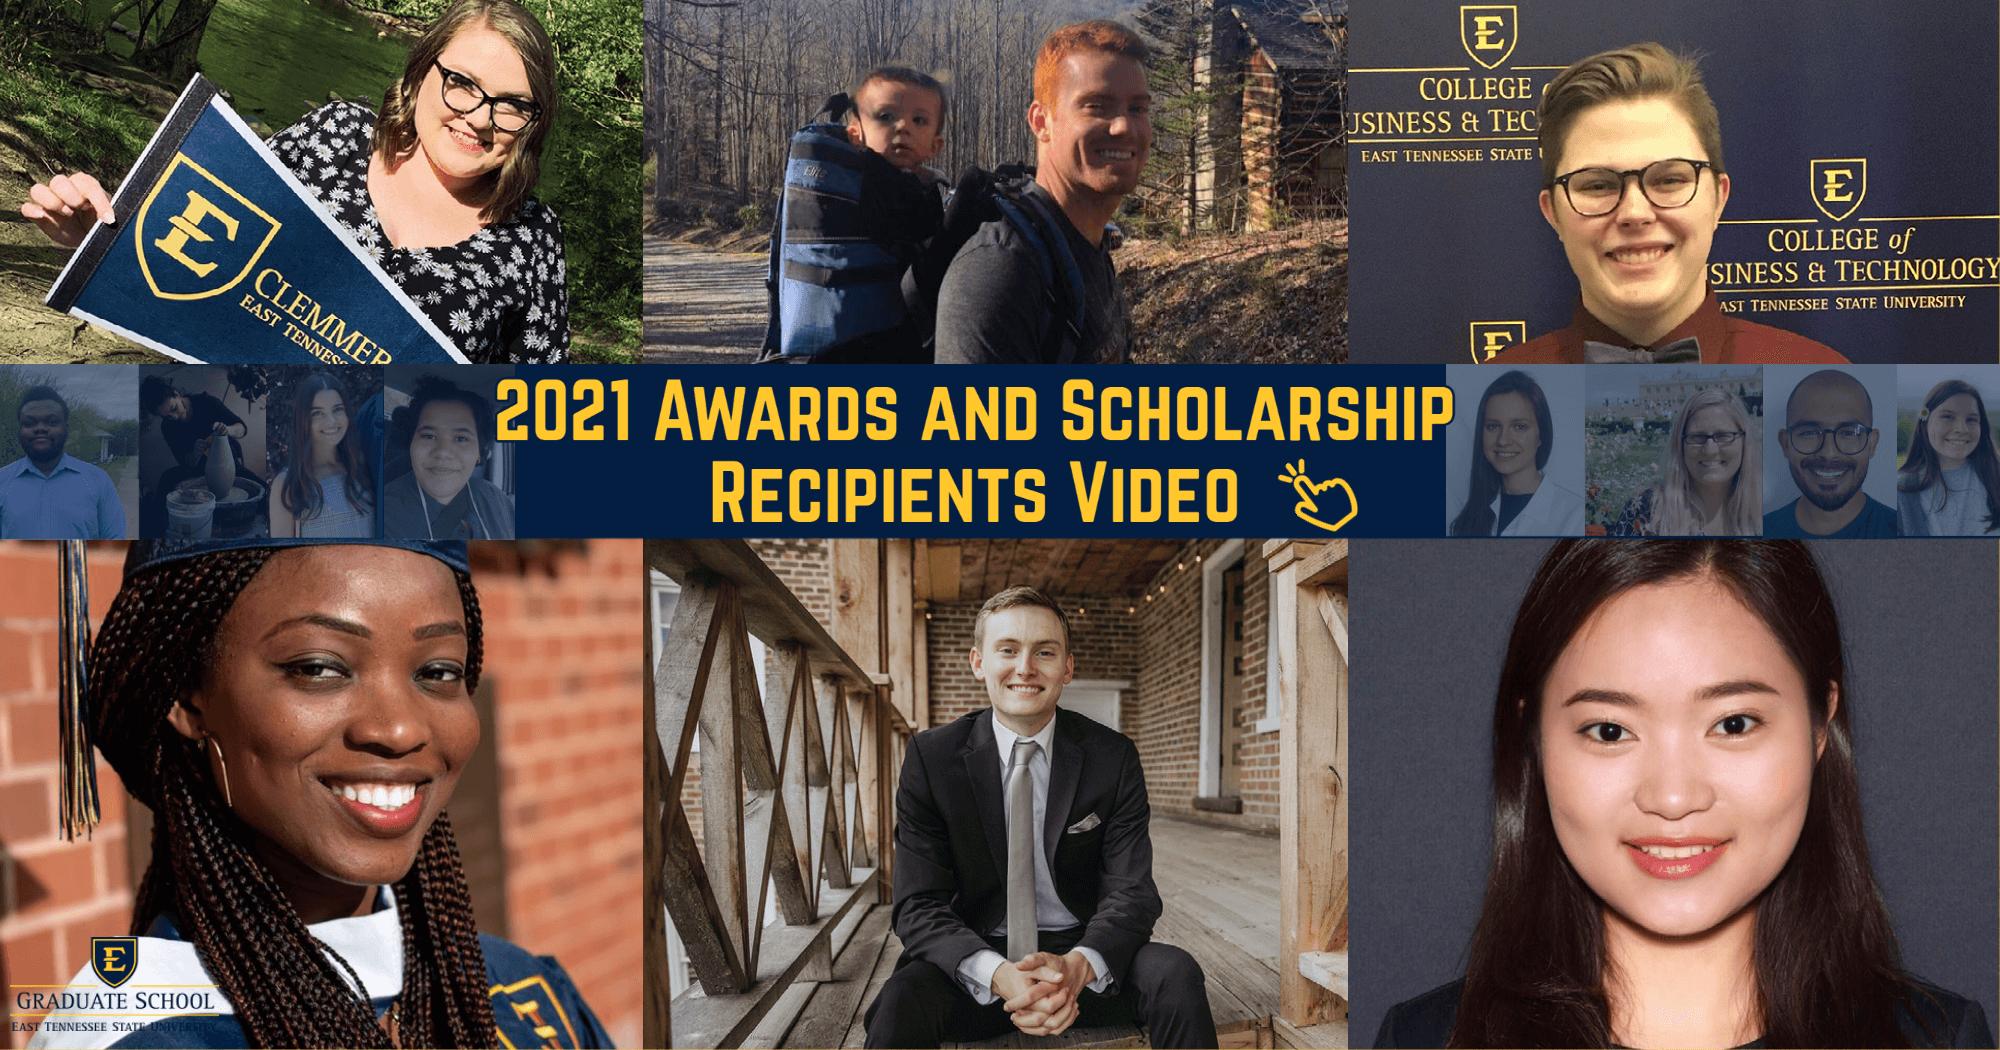 ETSU Graduate School 2021 Awards and Scholarship Recipients